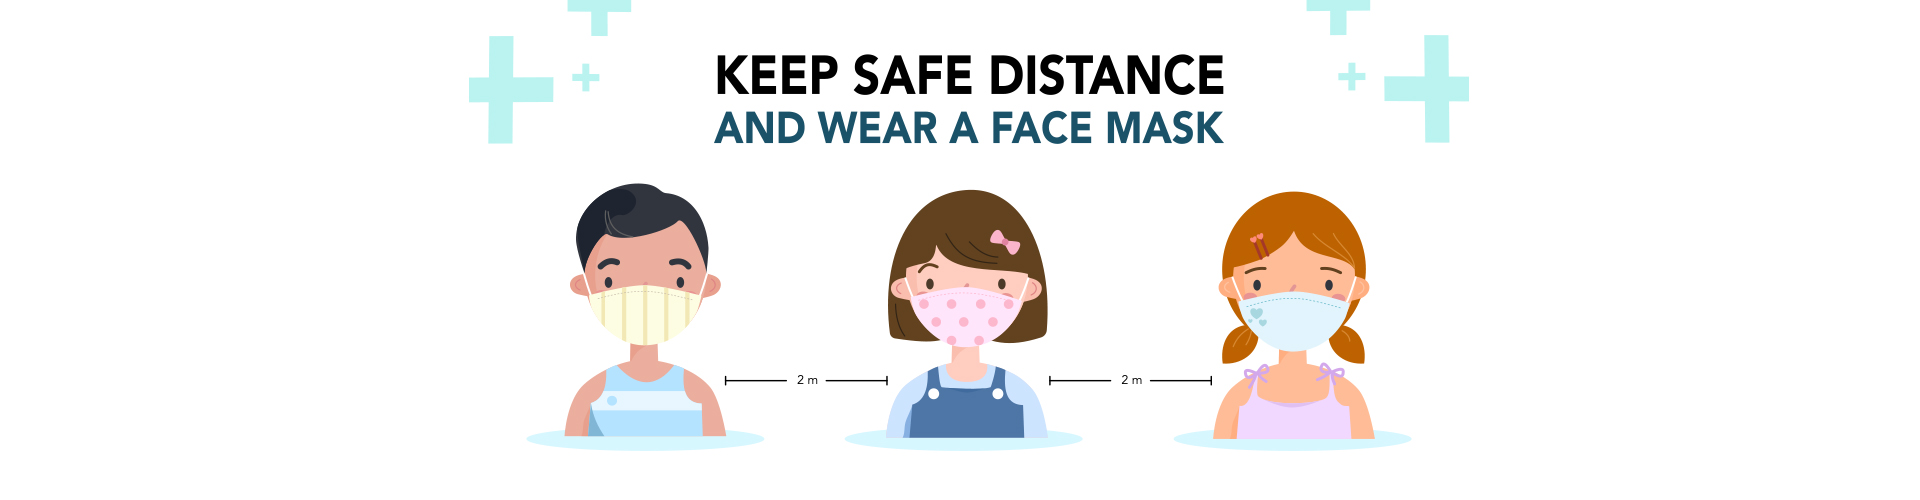 Children wearing fabric masks and keep safe distance